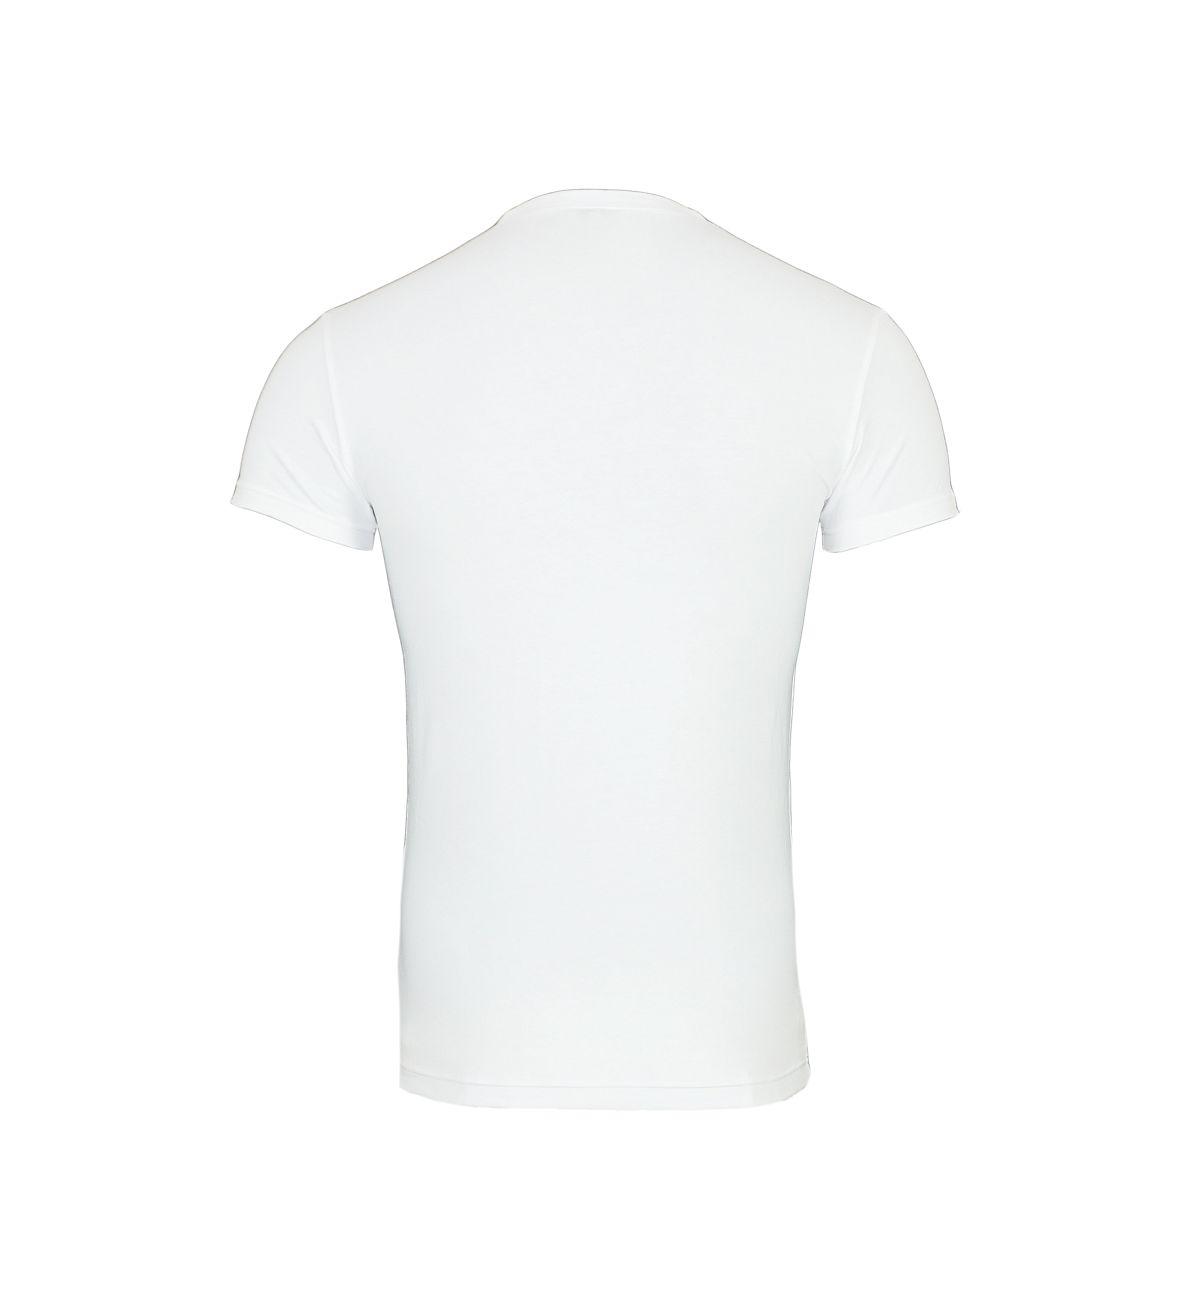 Emporio Armani T-Shirt Rundhals 111035 8P525 00010 BIANCO F18-EAT1